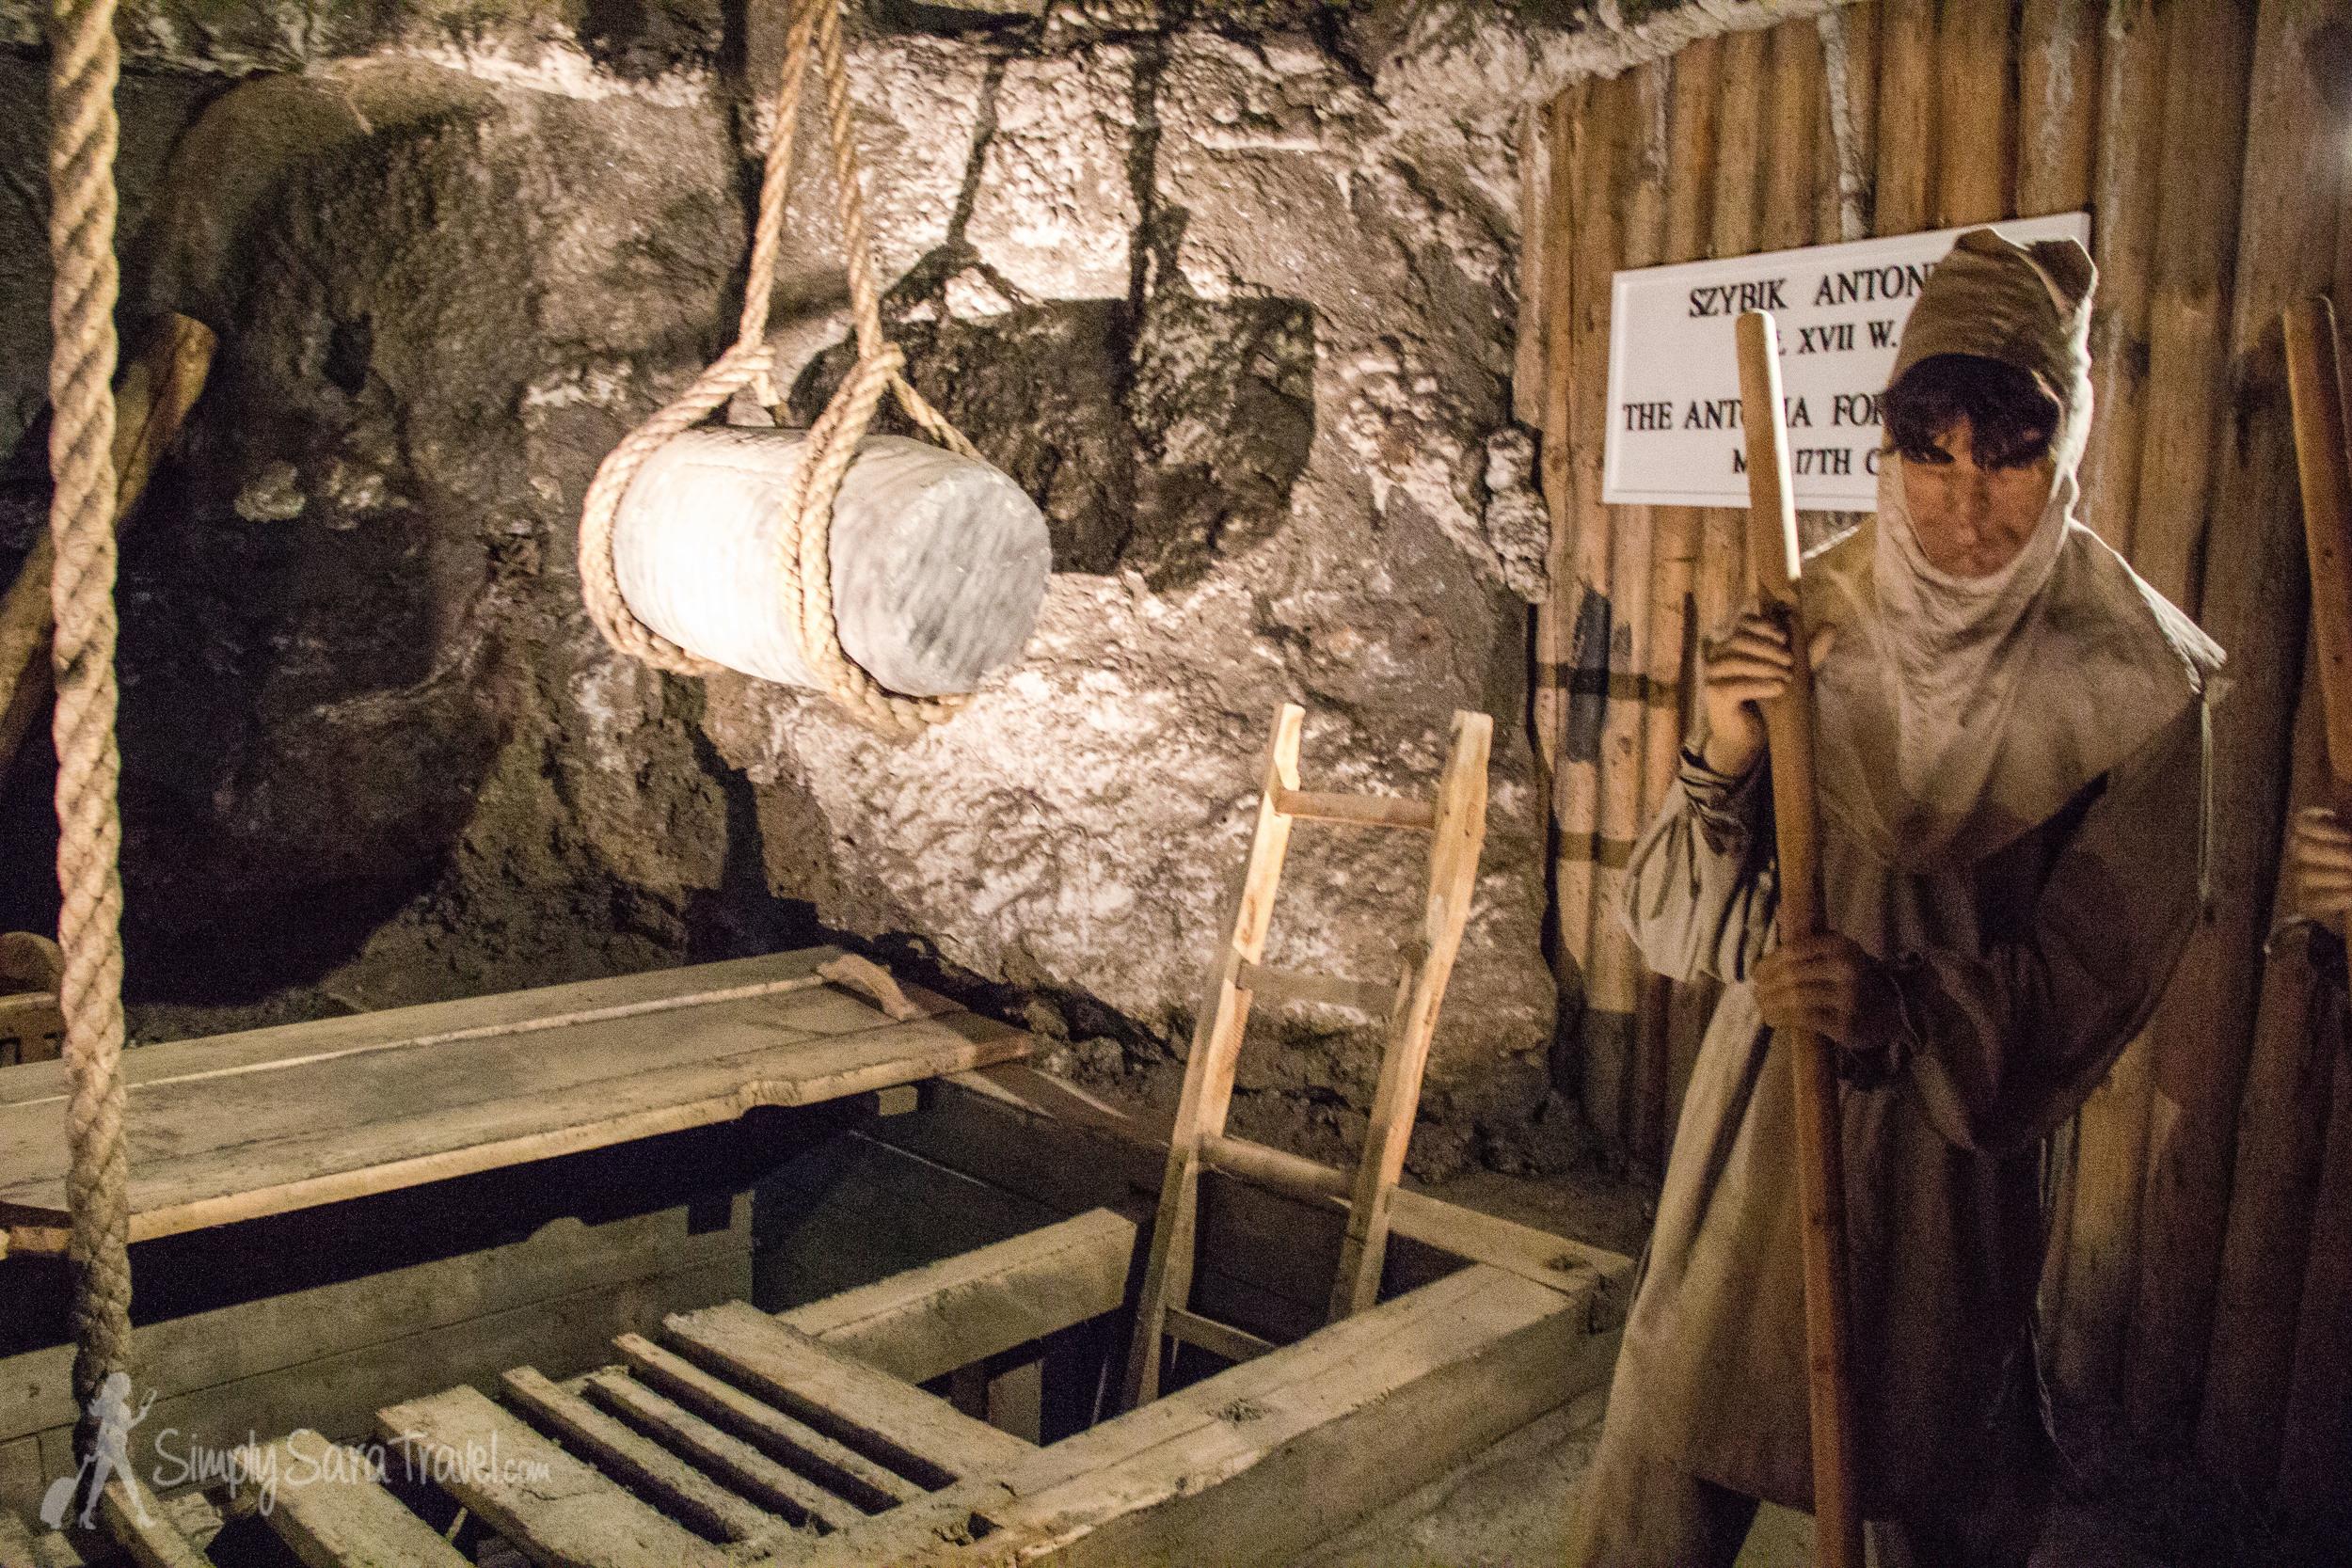 Model of a miner at work in theWieliczka Salt Mine